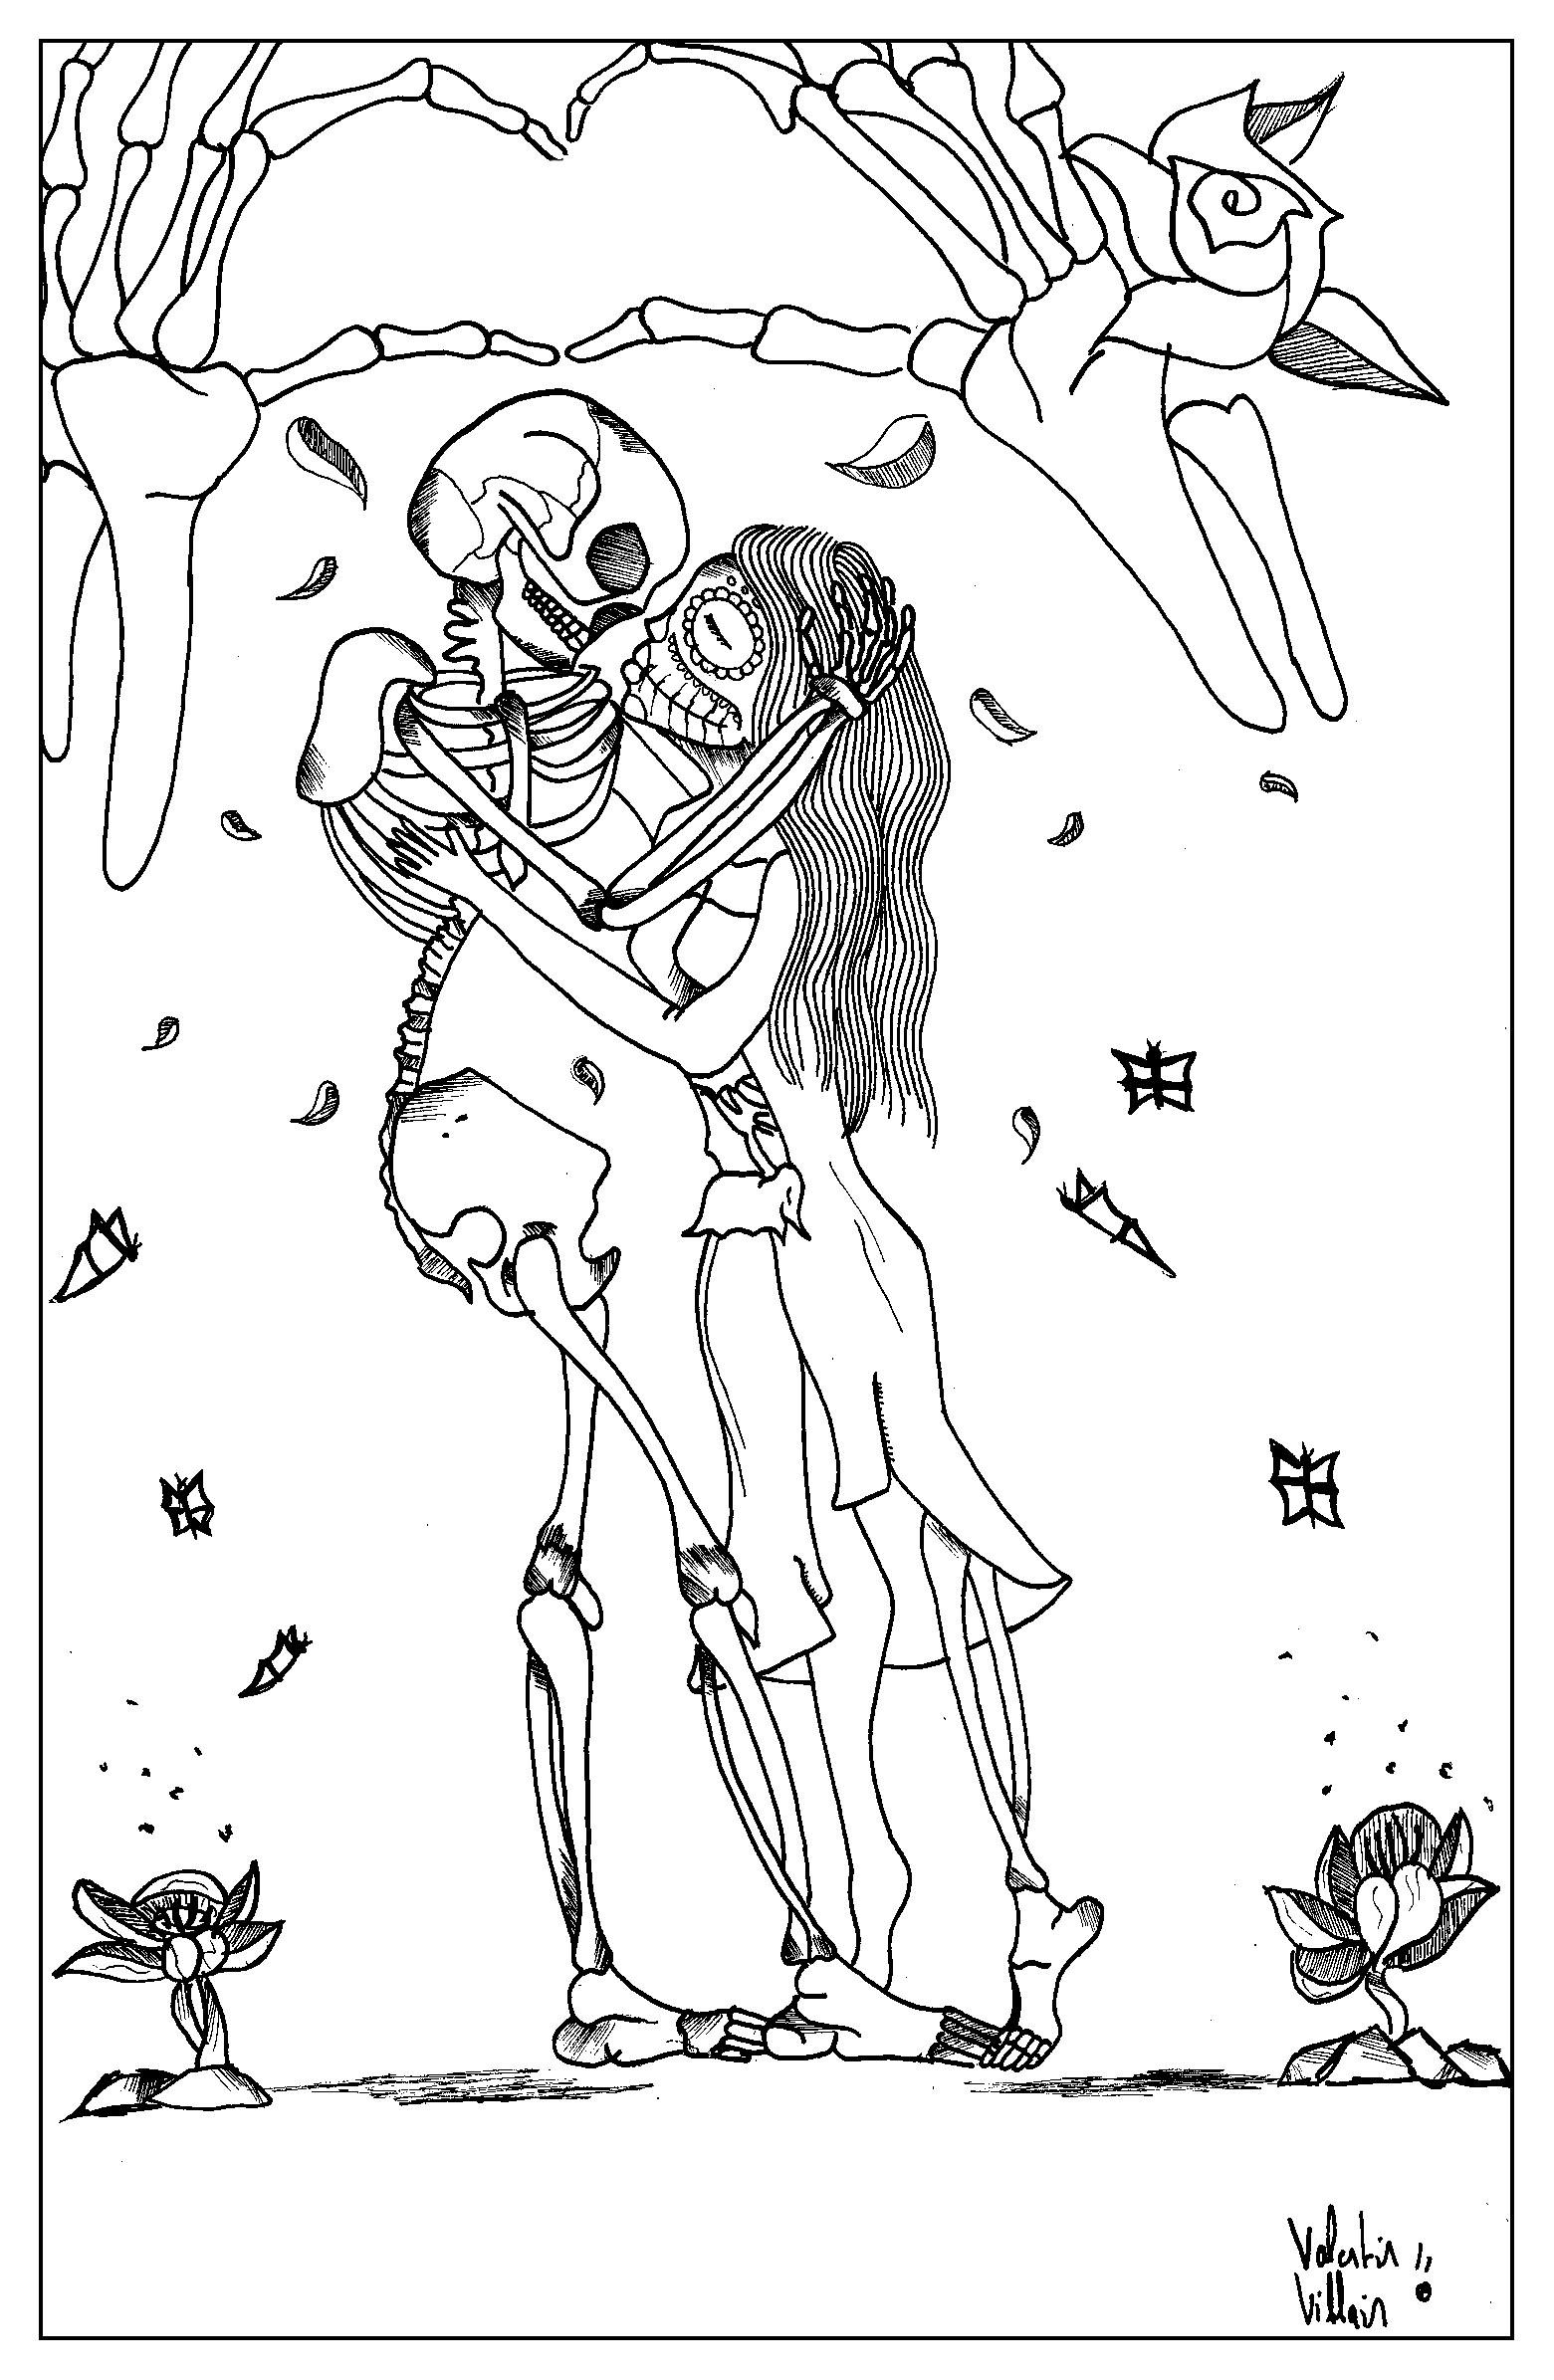 50071 - Día De San Valentín - Colorear para Adultos